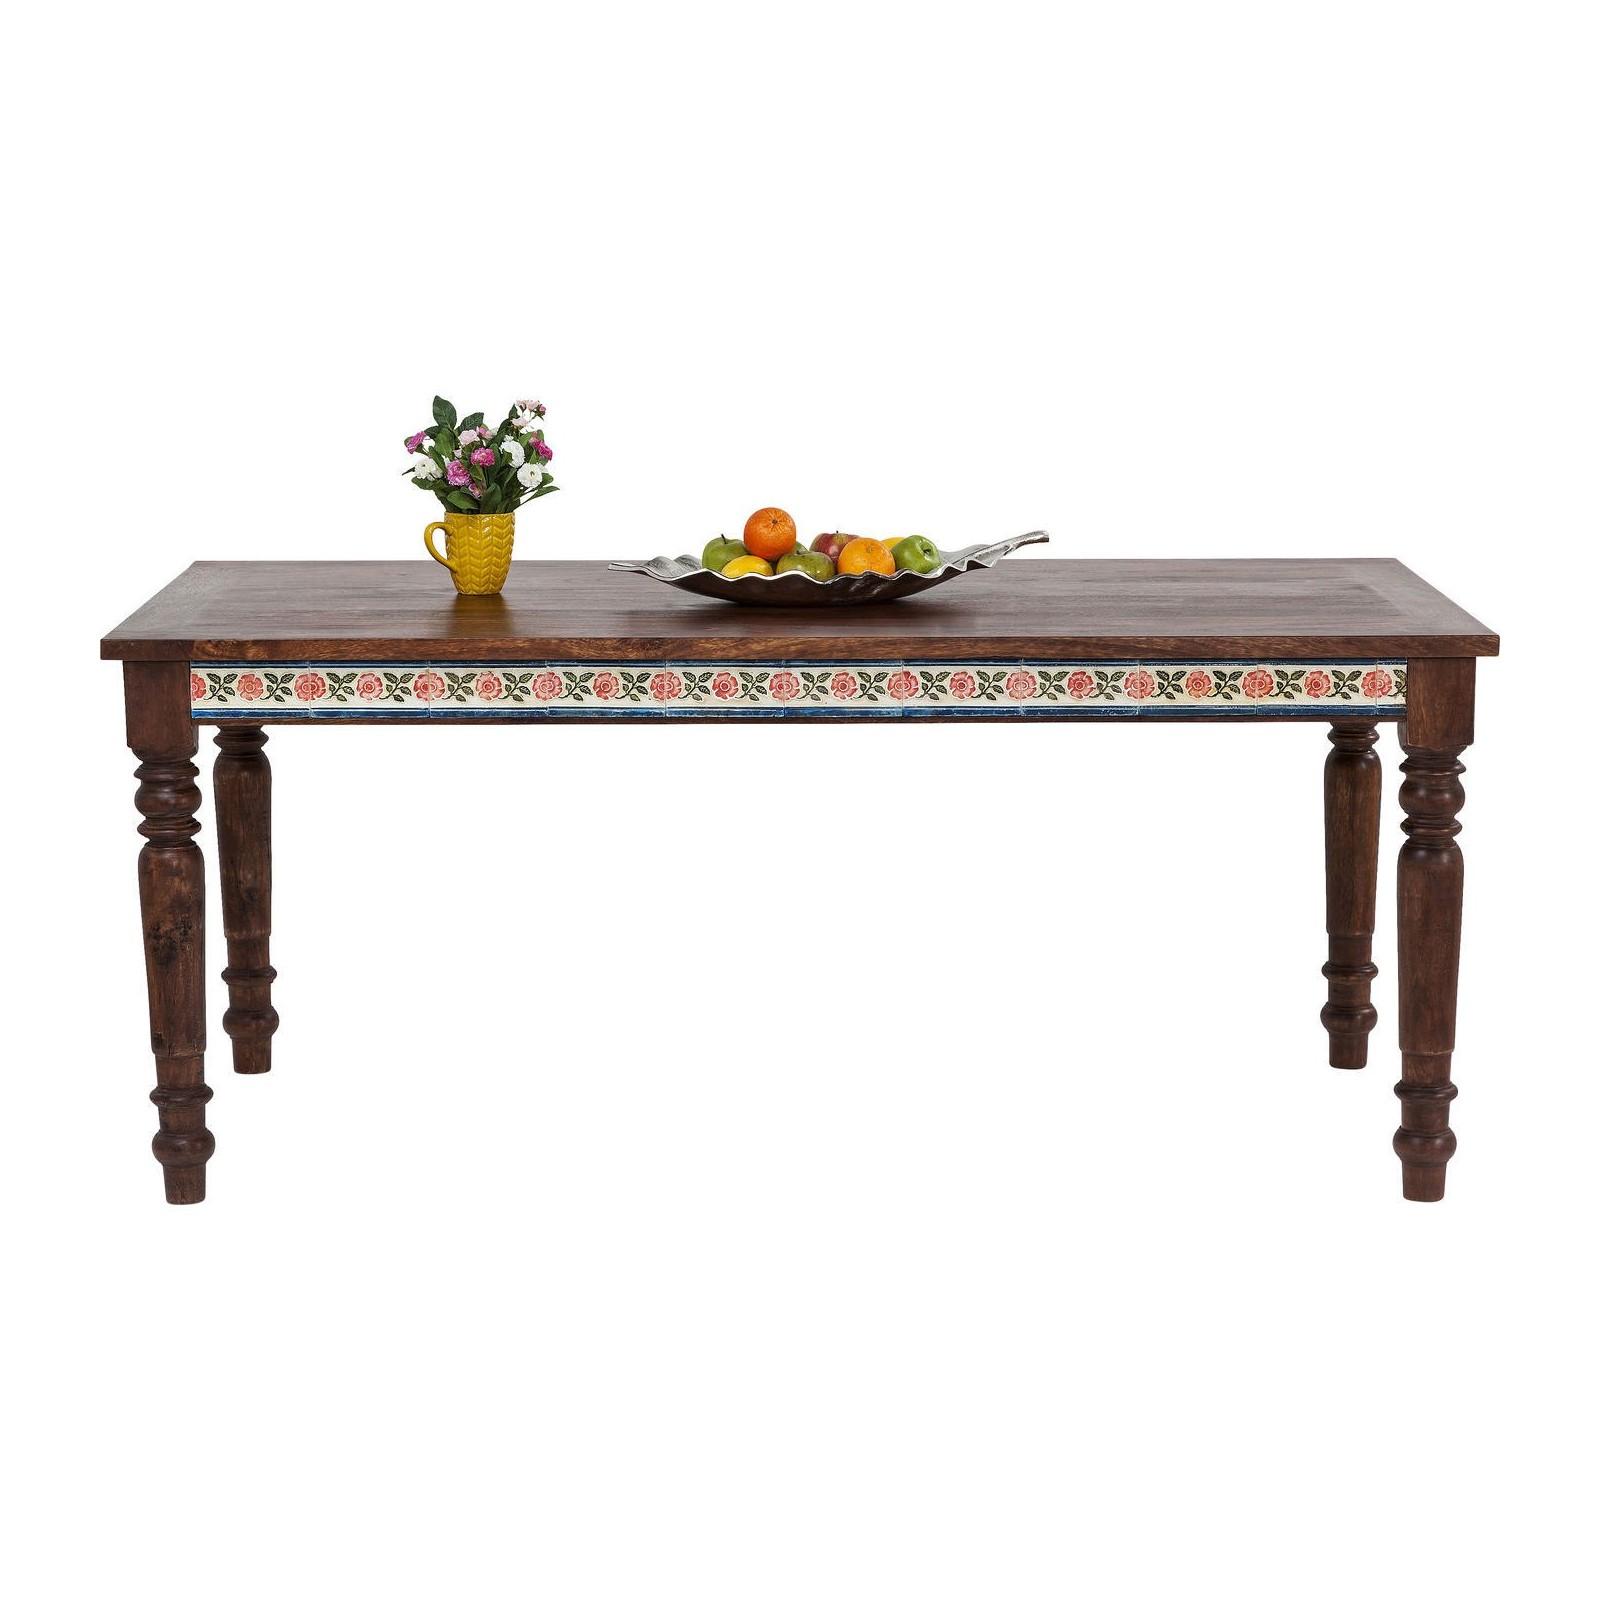 TABLE VINTAGE ROMANCE 180X90 CM KARE DESIGN